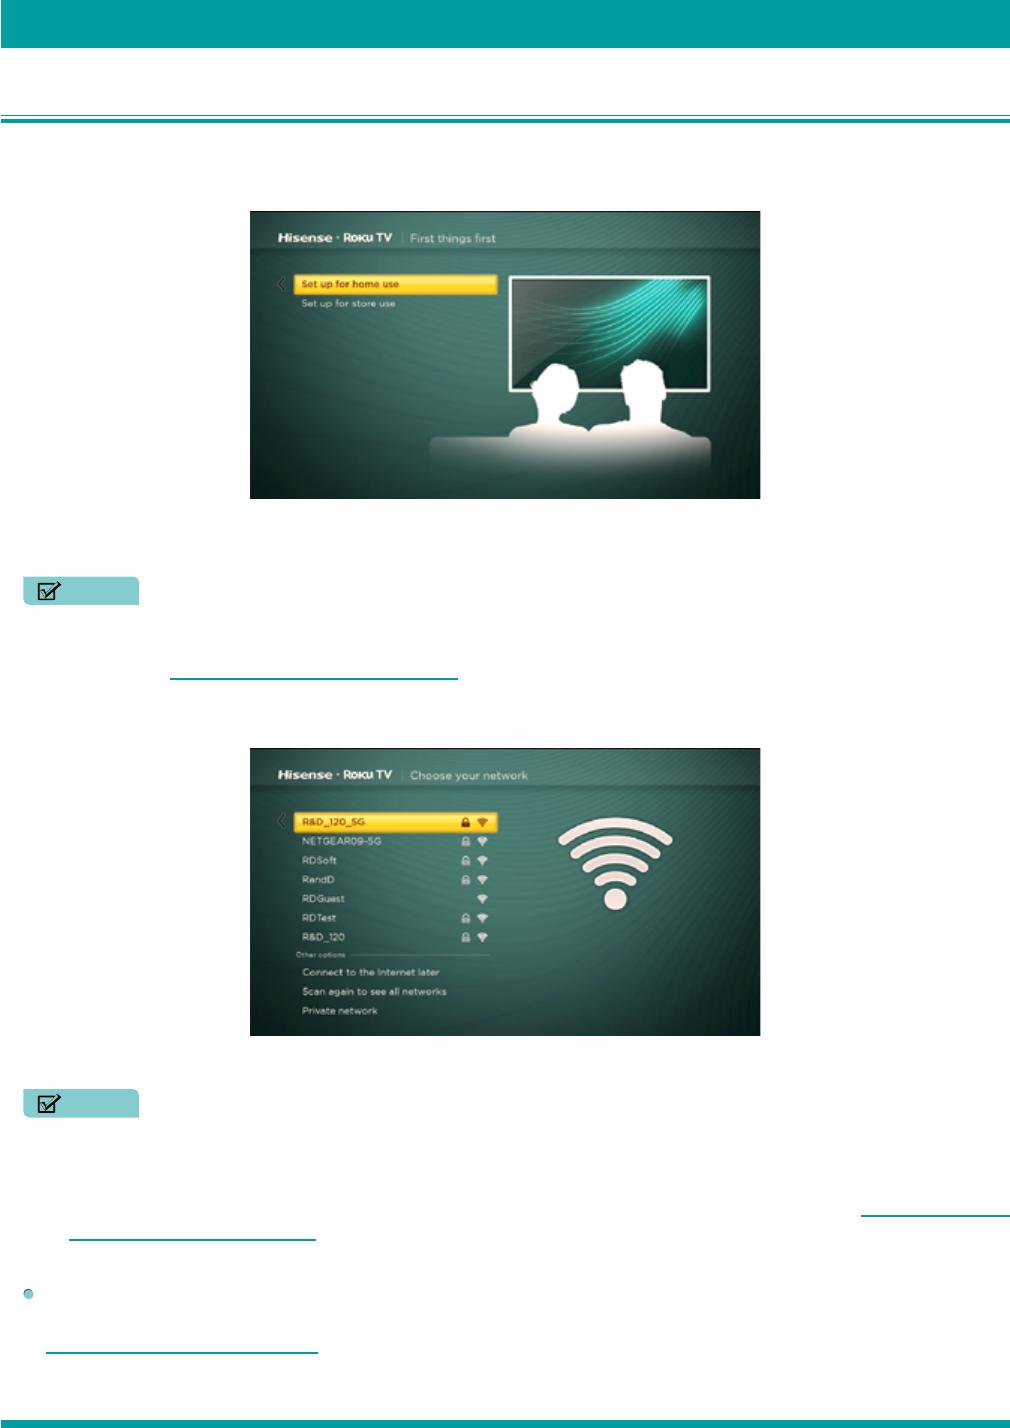 Hisense Electric LCDF0104 LED LCD TV User Manual